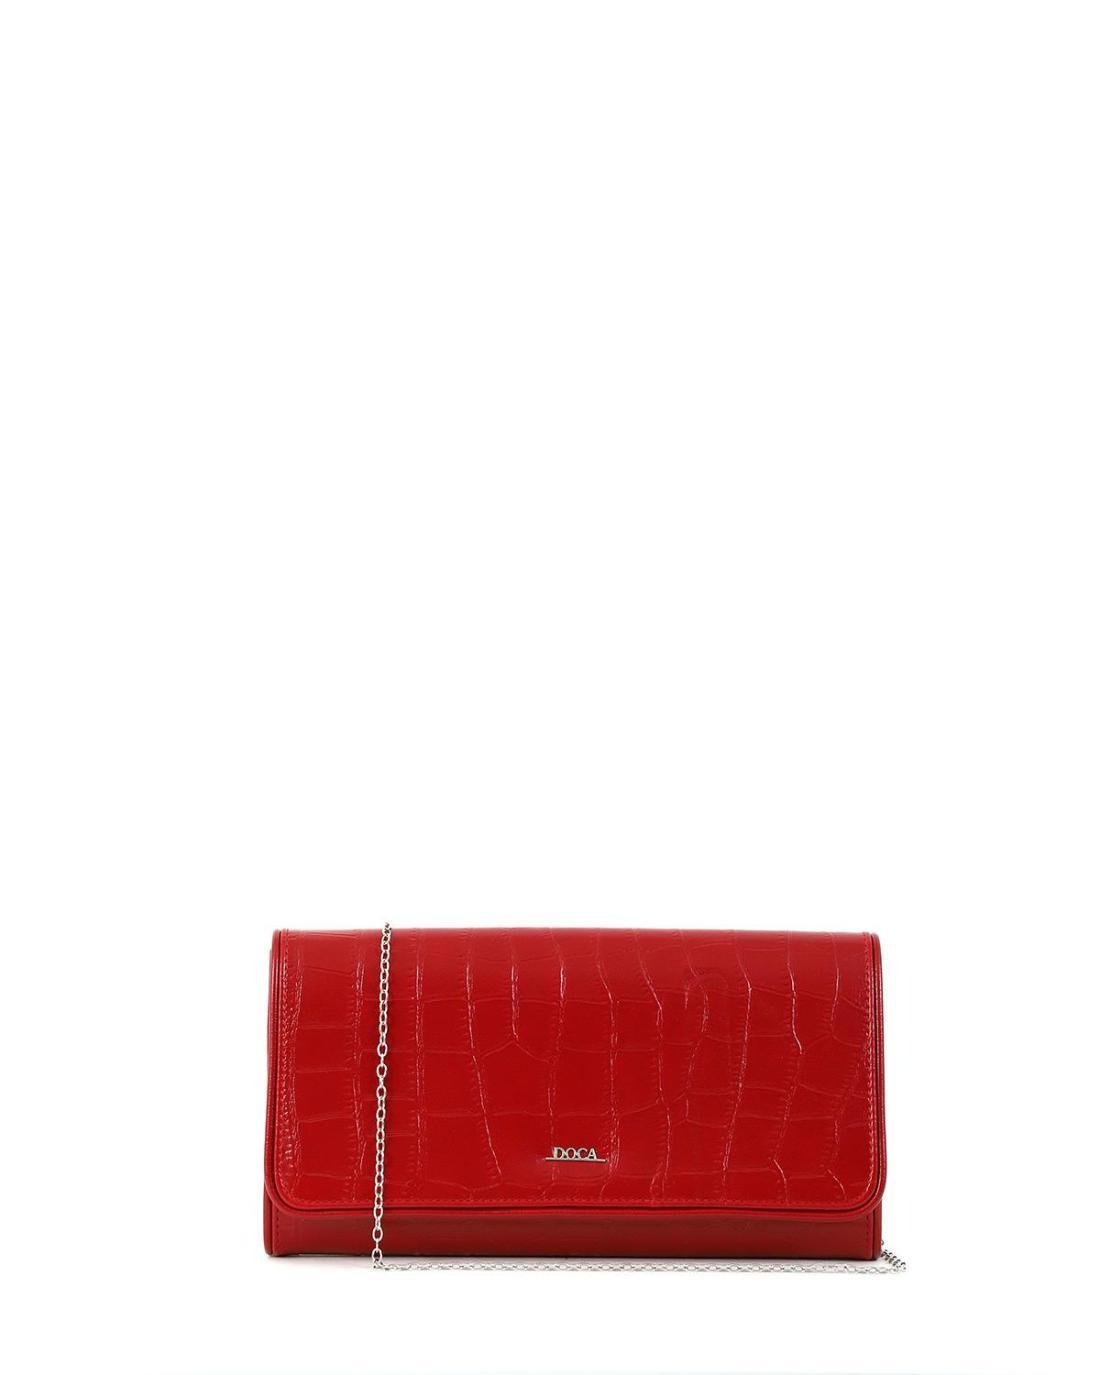 Red envelope bag